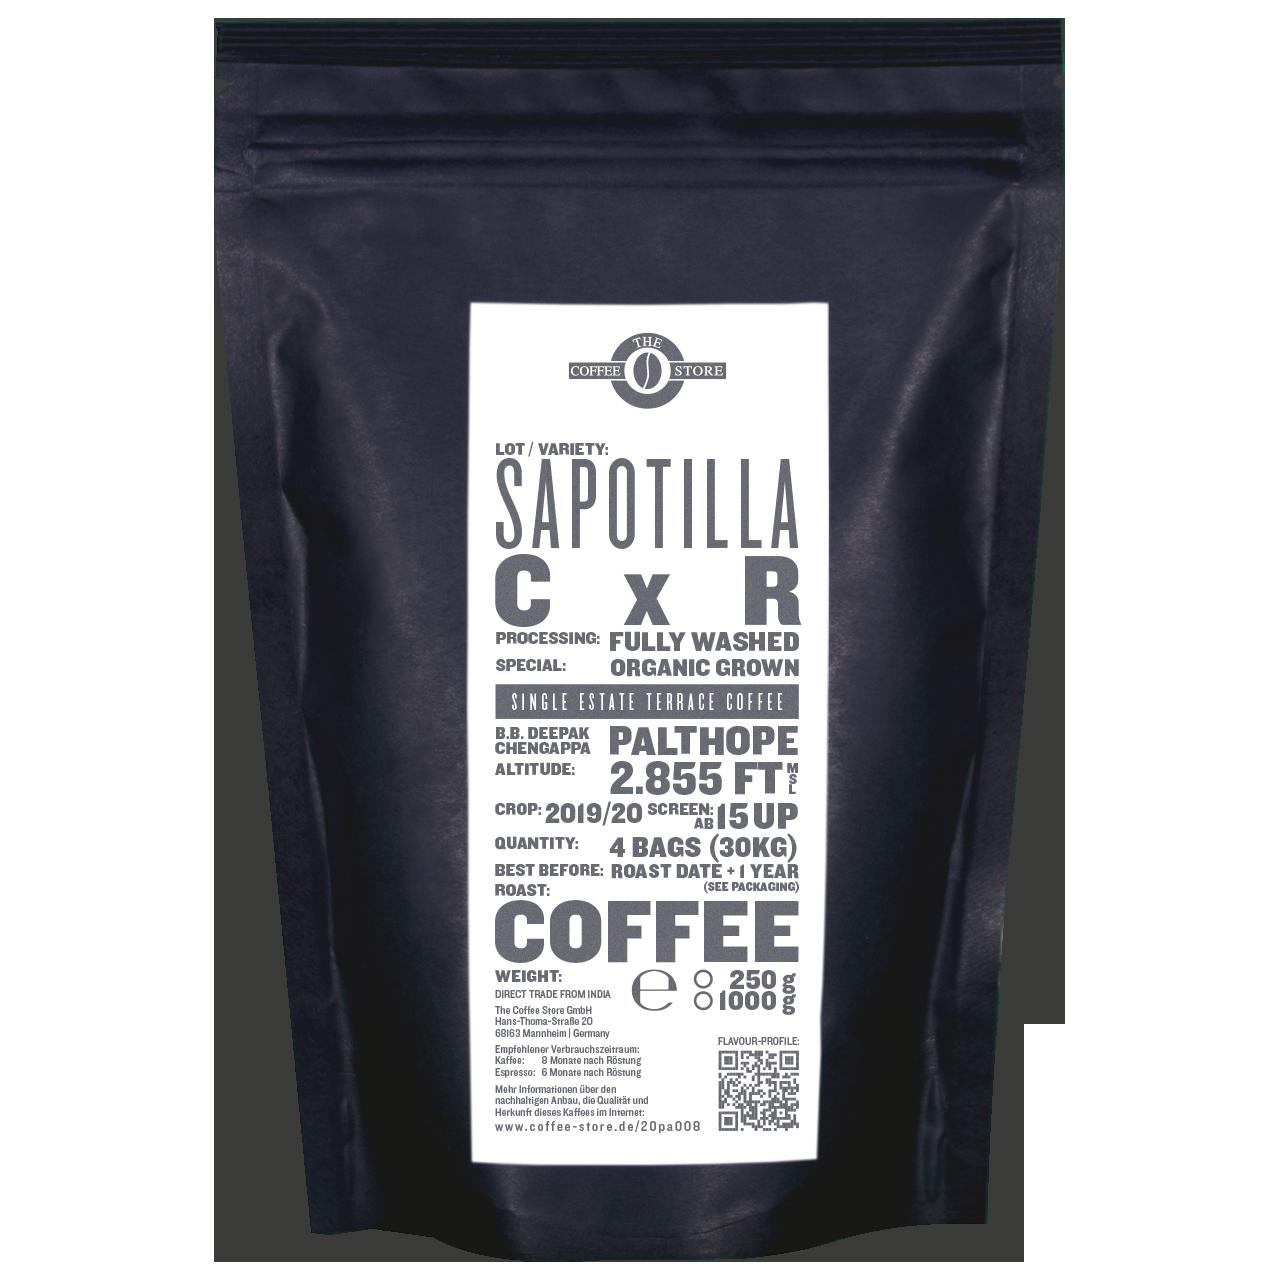 Sapotilla, CxR - Kaffeeröstung